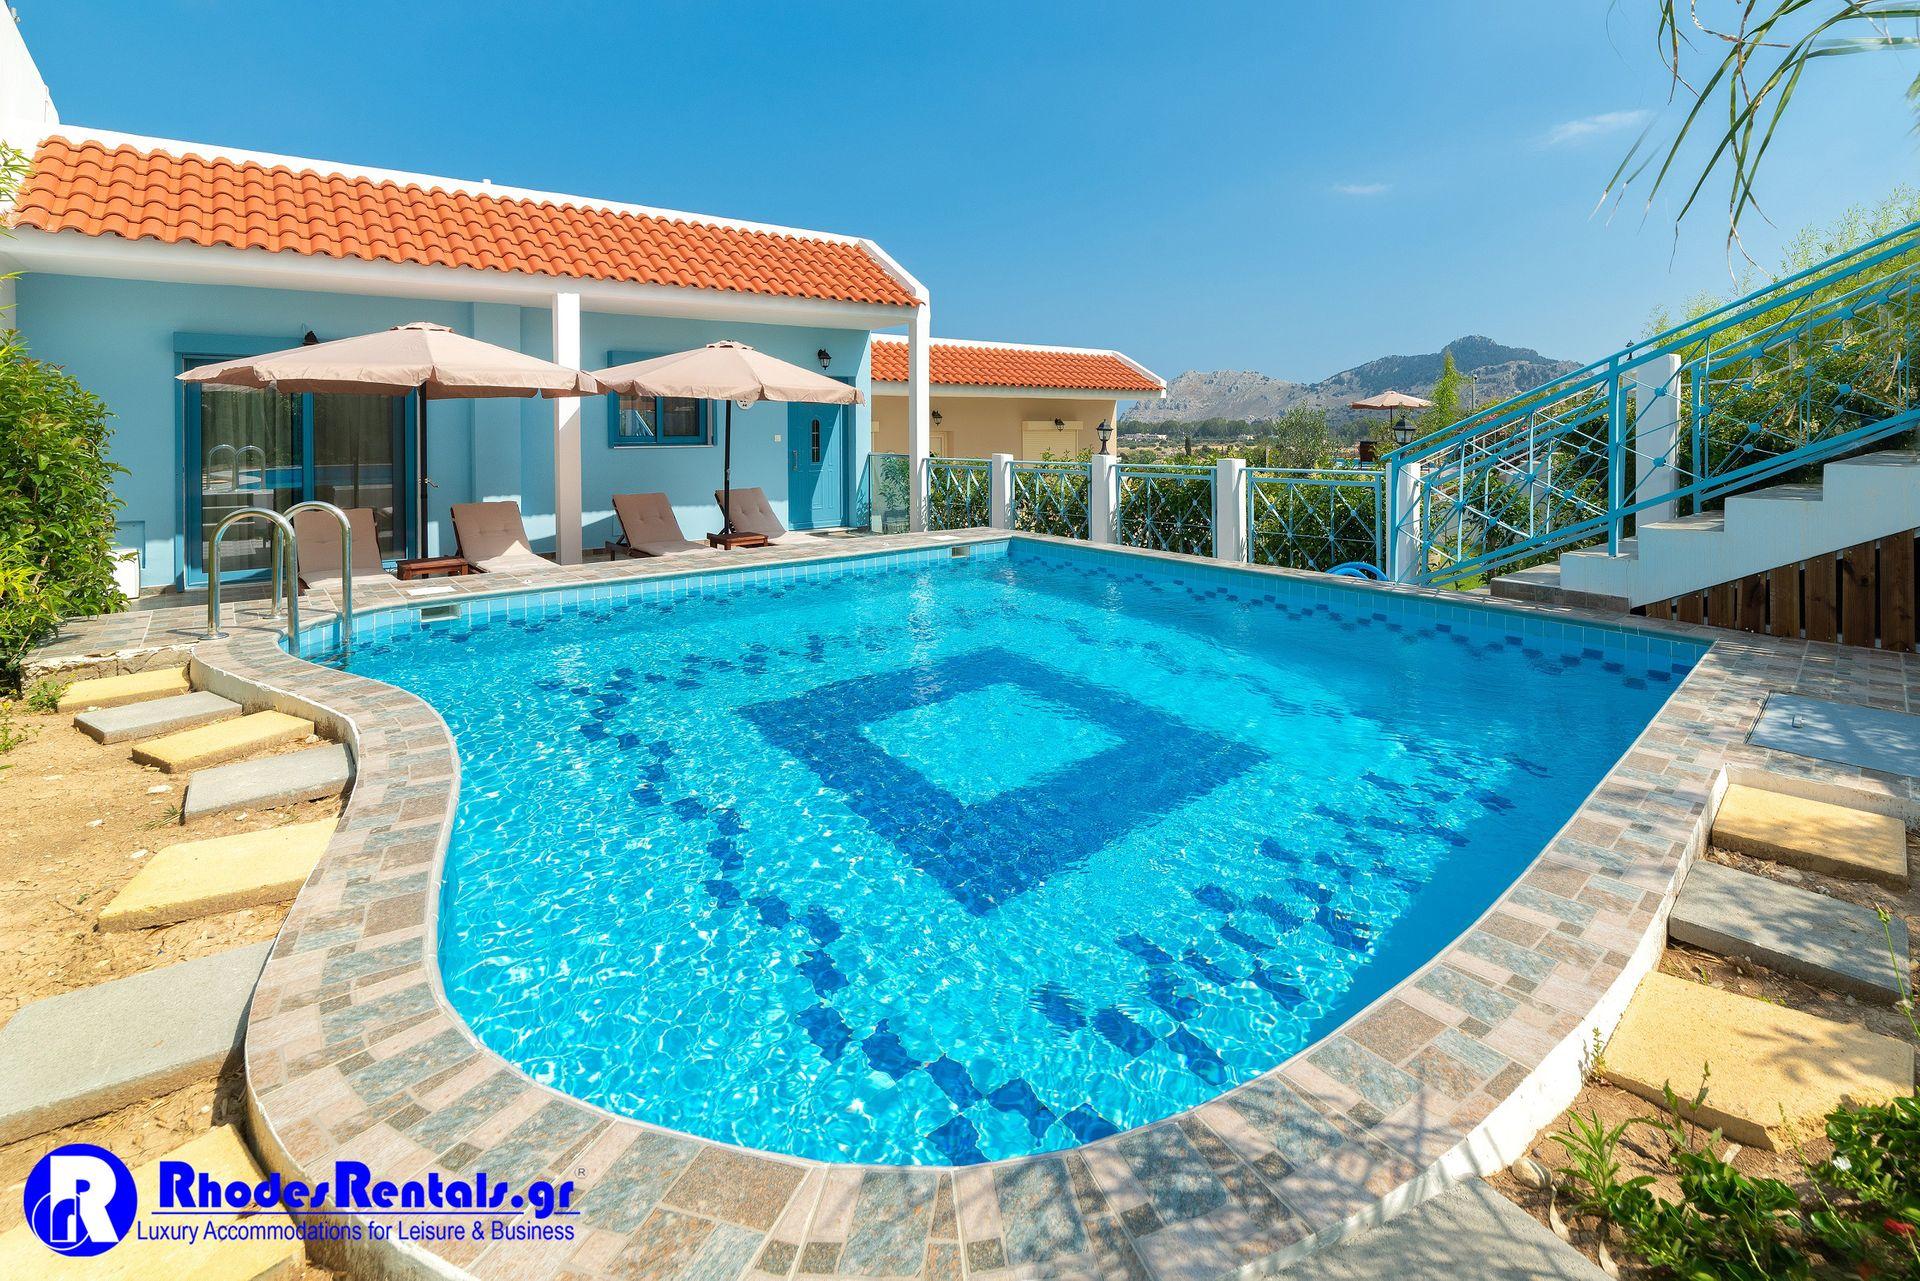 Kolymbia Dreams Luxury Apartments Rhodes - Κολύμπια, Ρόδος ✦ 2 Ημέρες (1 Διανυκτέρευση) ✦ 5 άτομα ✦ Χωρίς Πρωινό ✦ 01/09/2020 έως 30/09/2020 ✦ Free WiFi